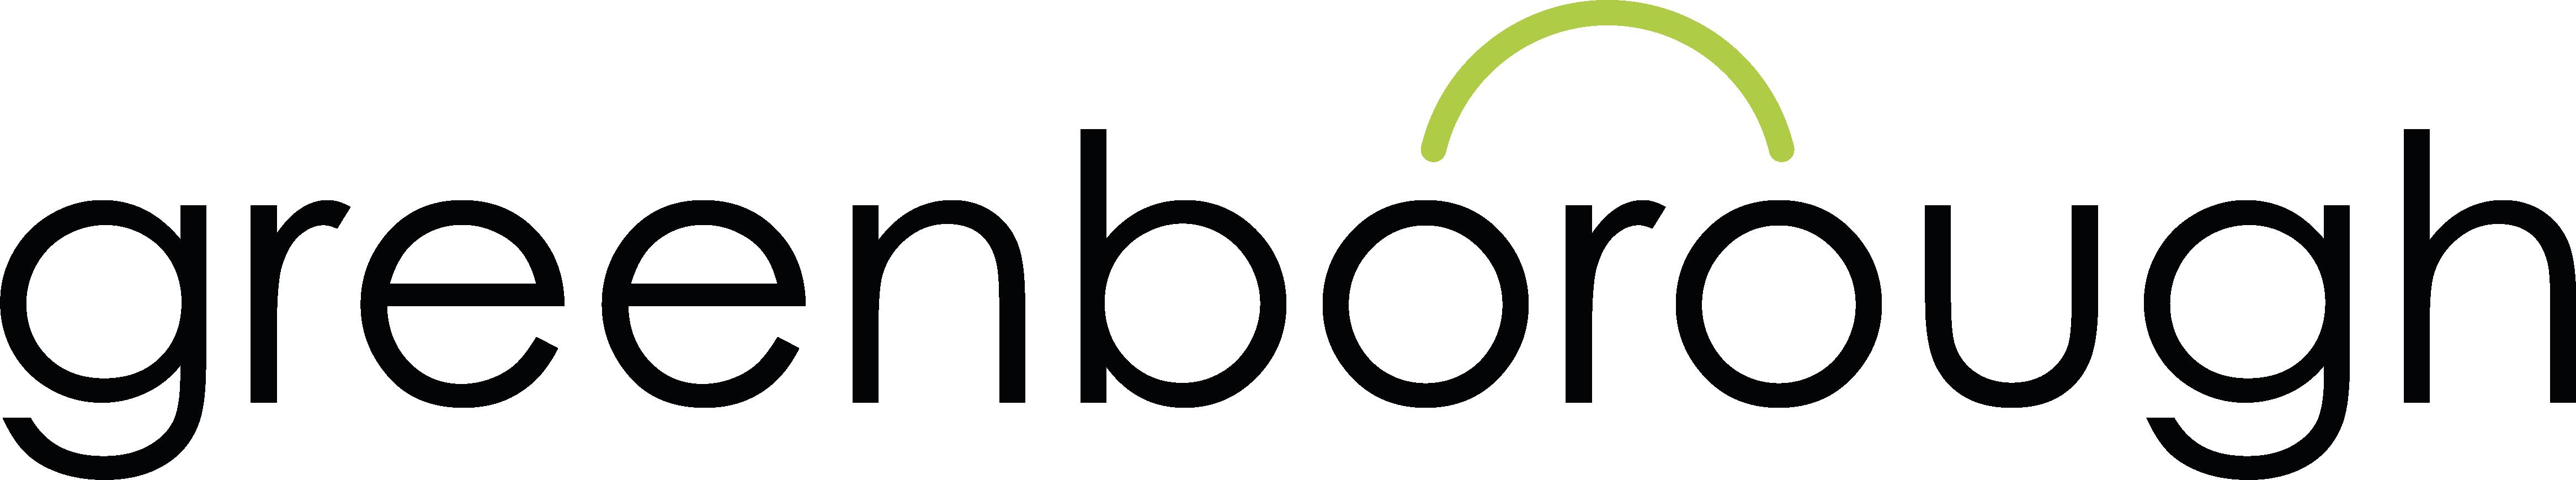 greenborough logo transparent